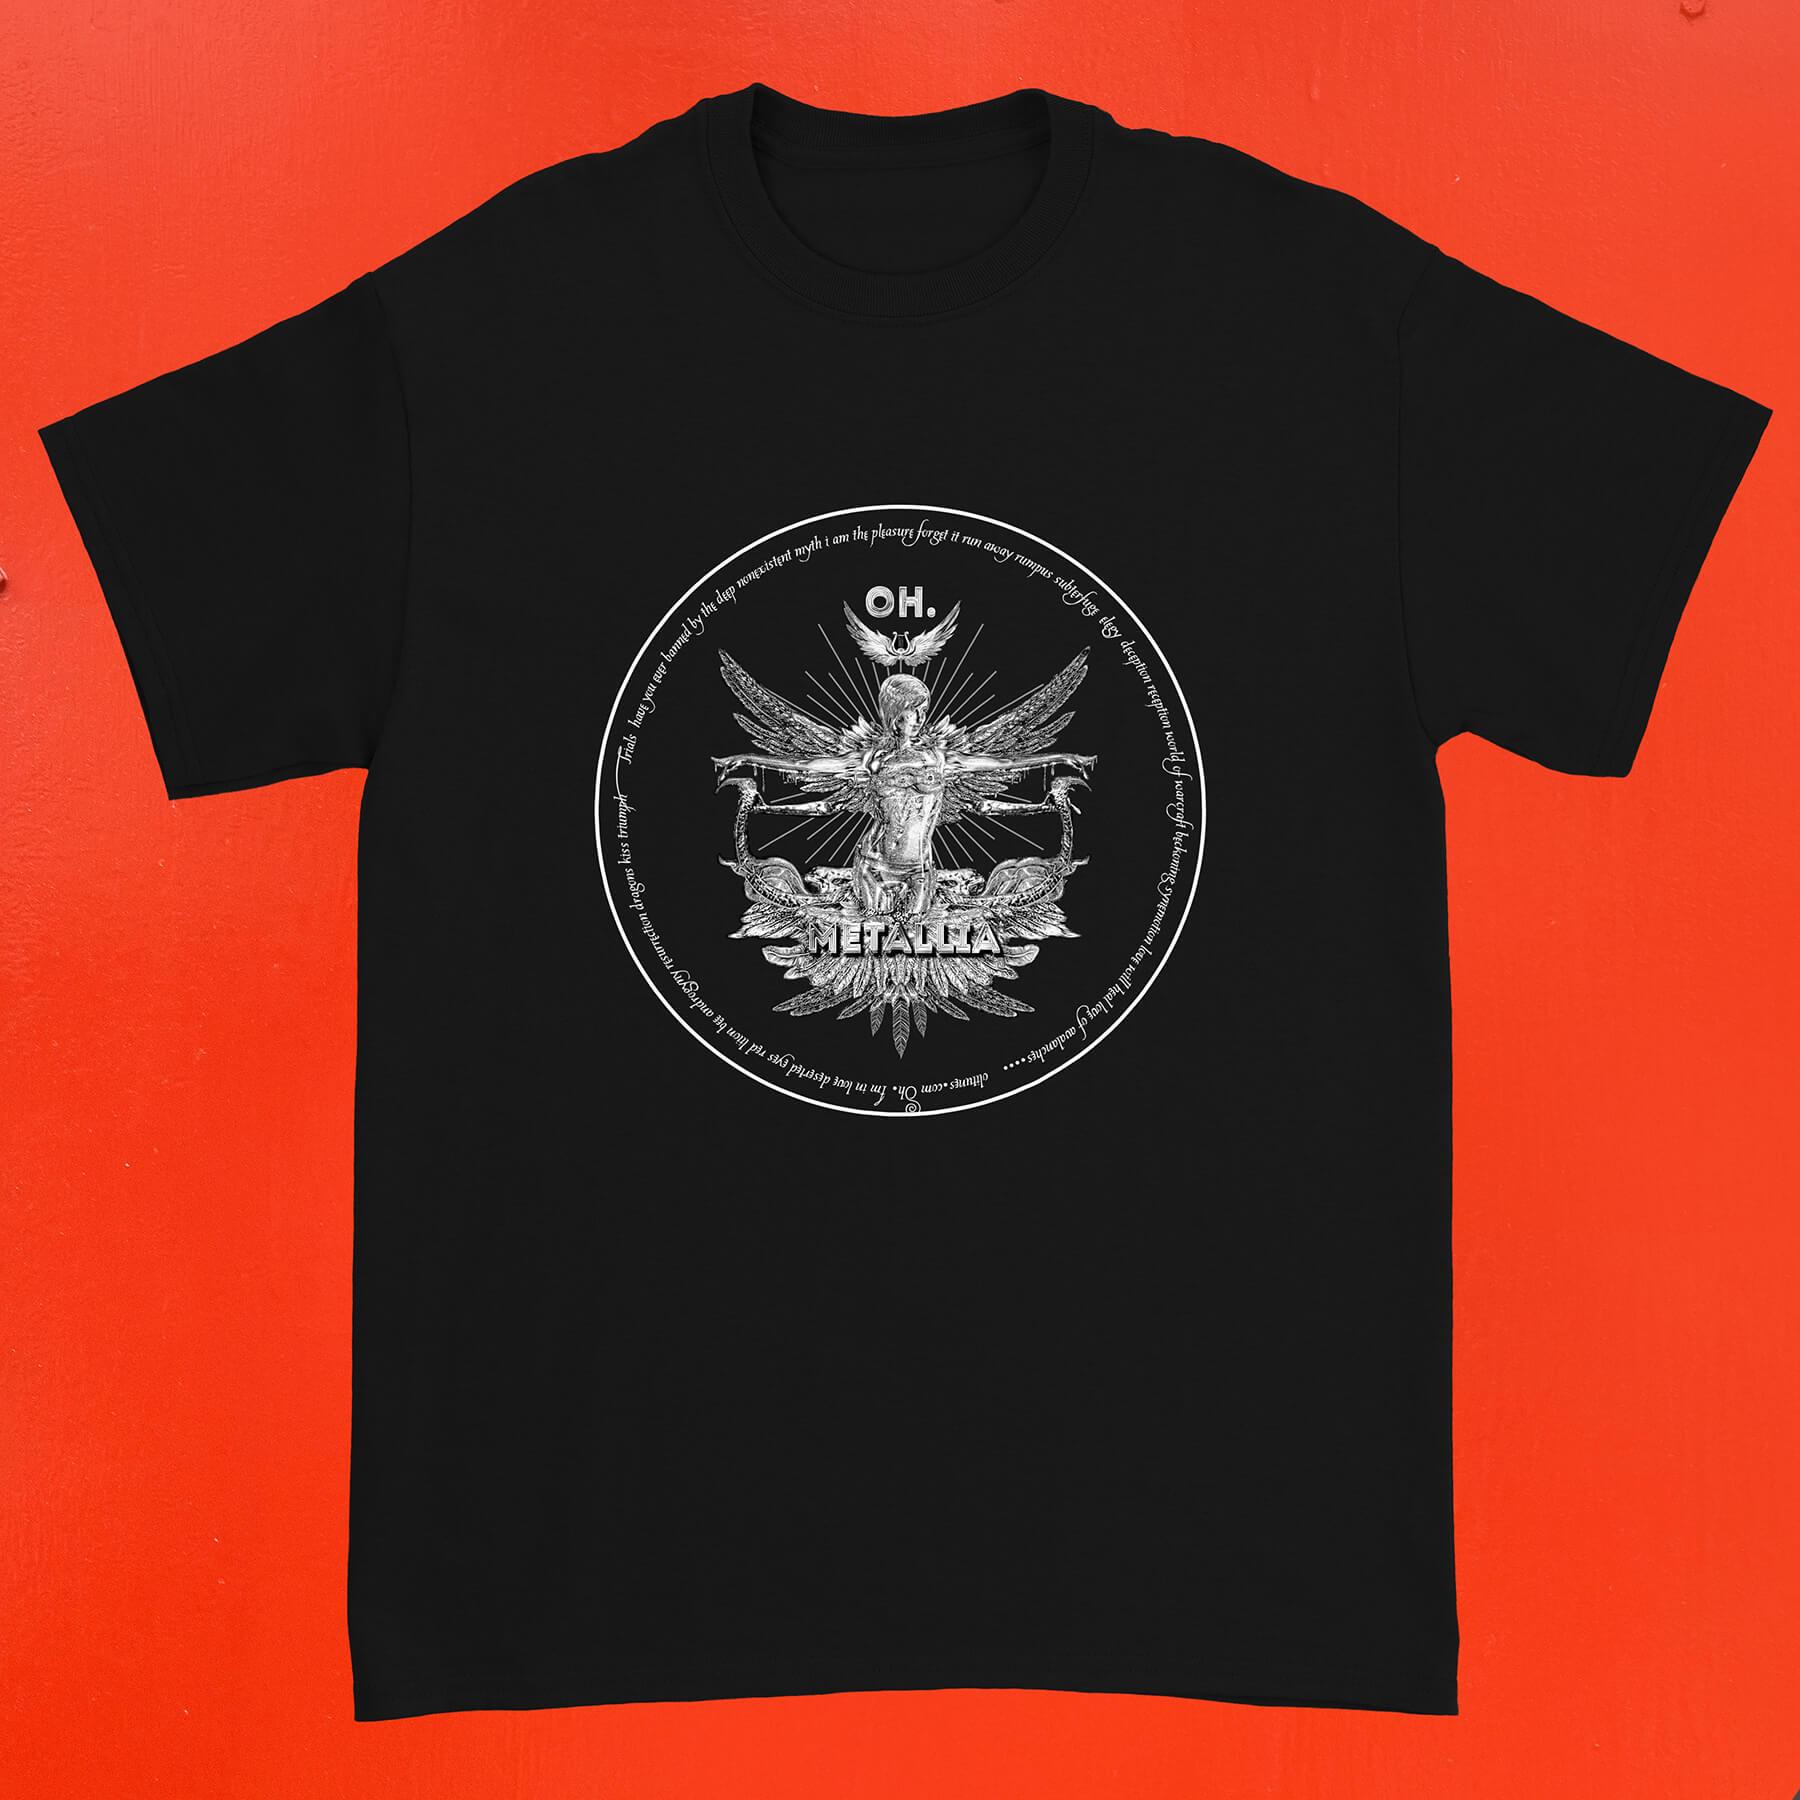 Metallia Emblem T-shirt